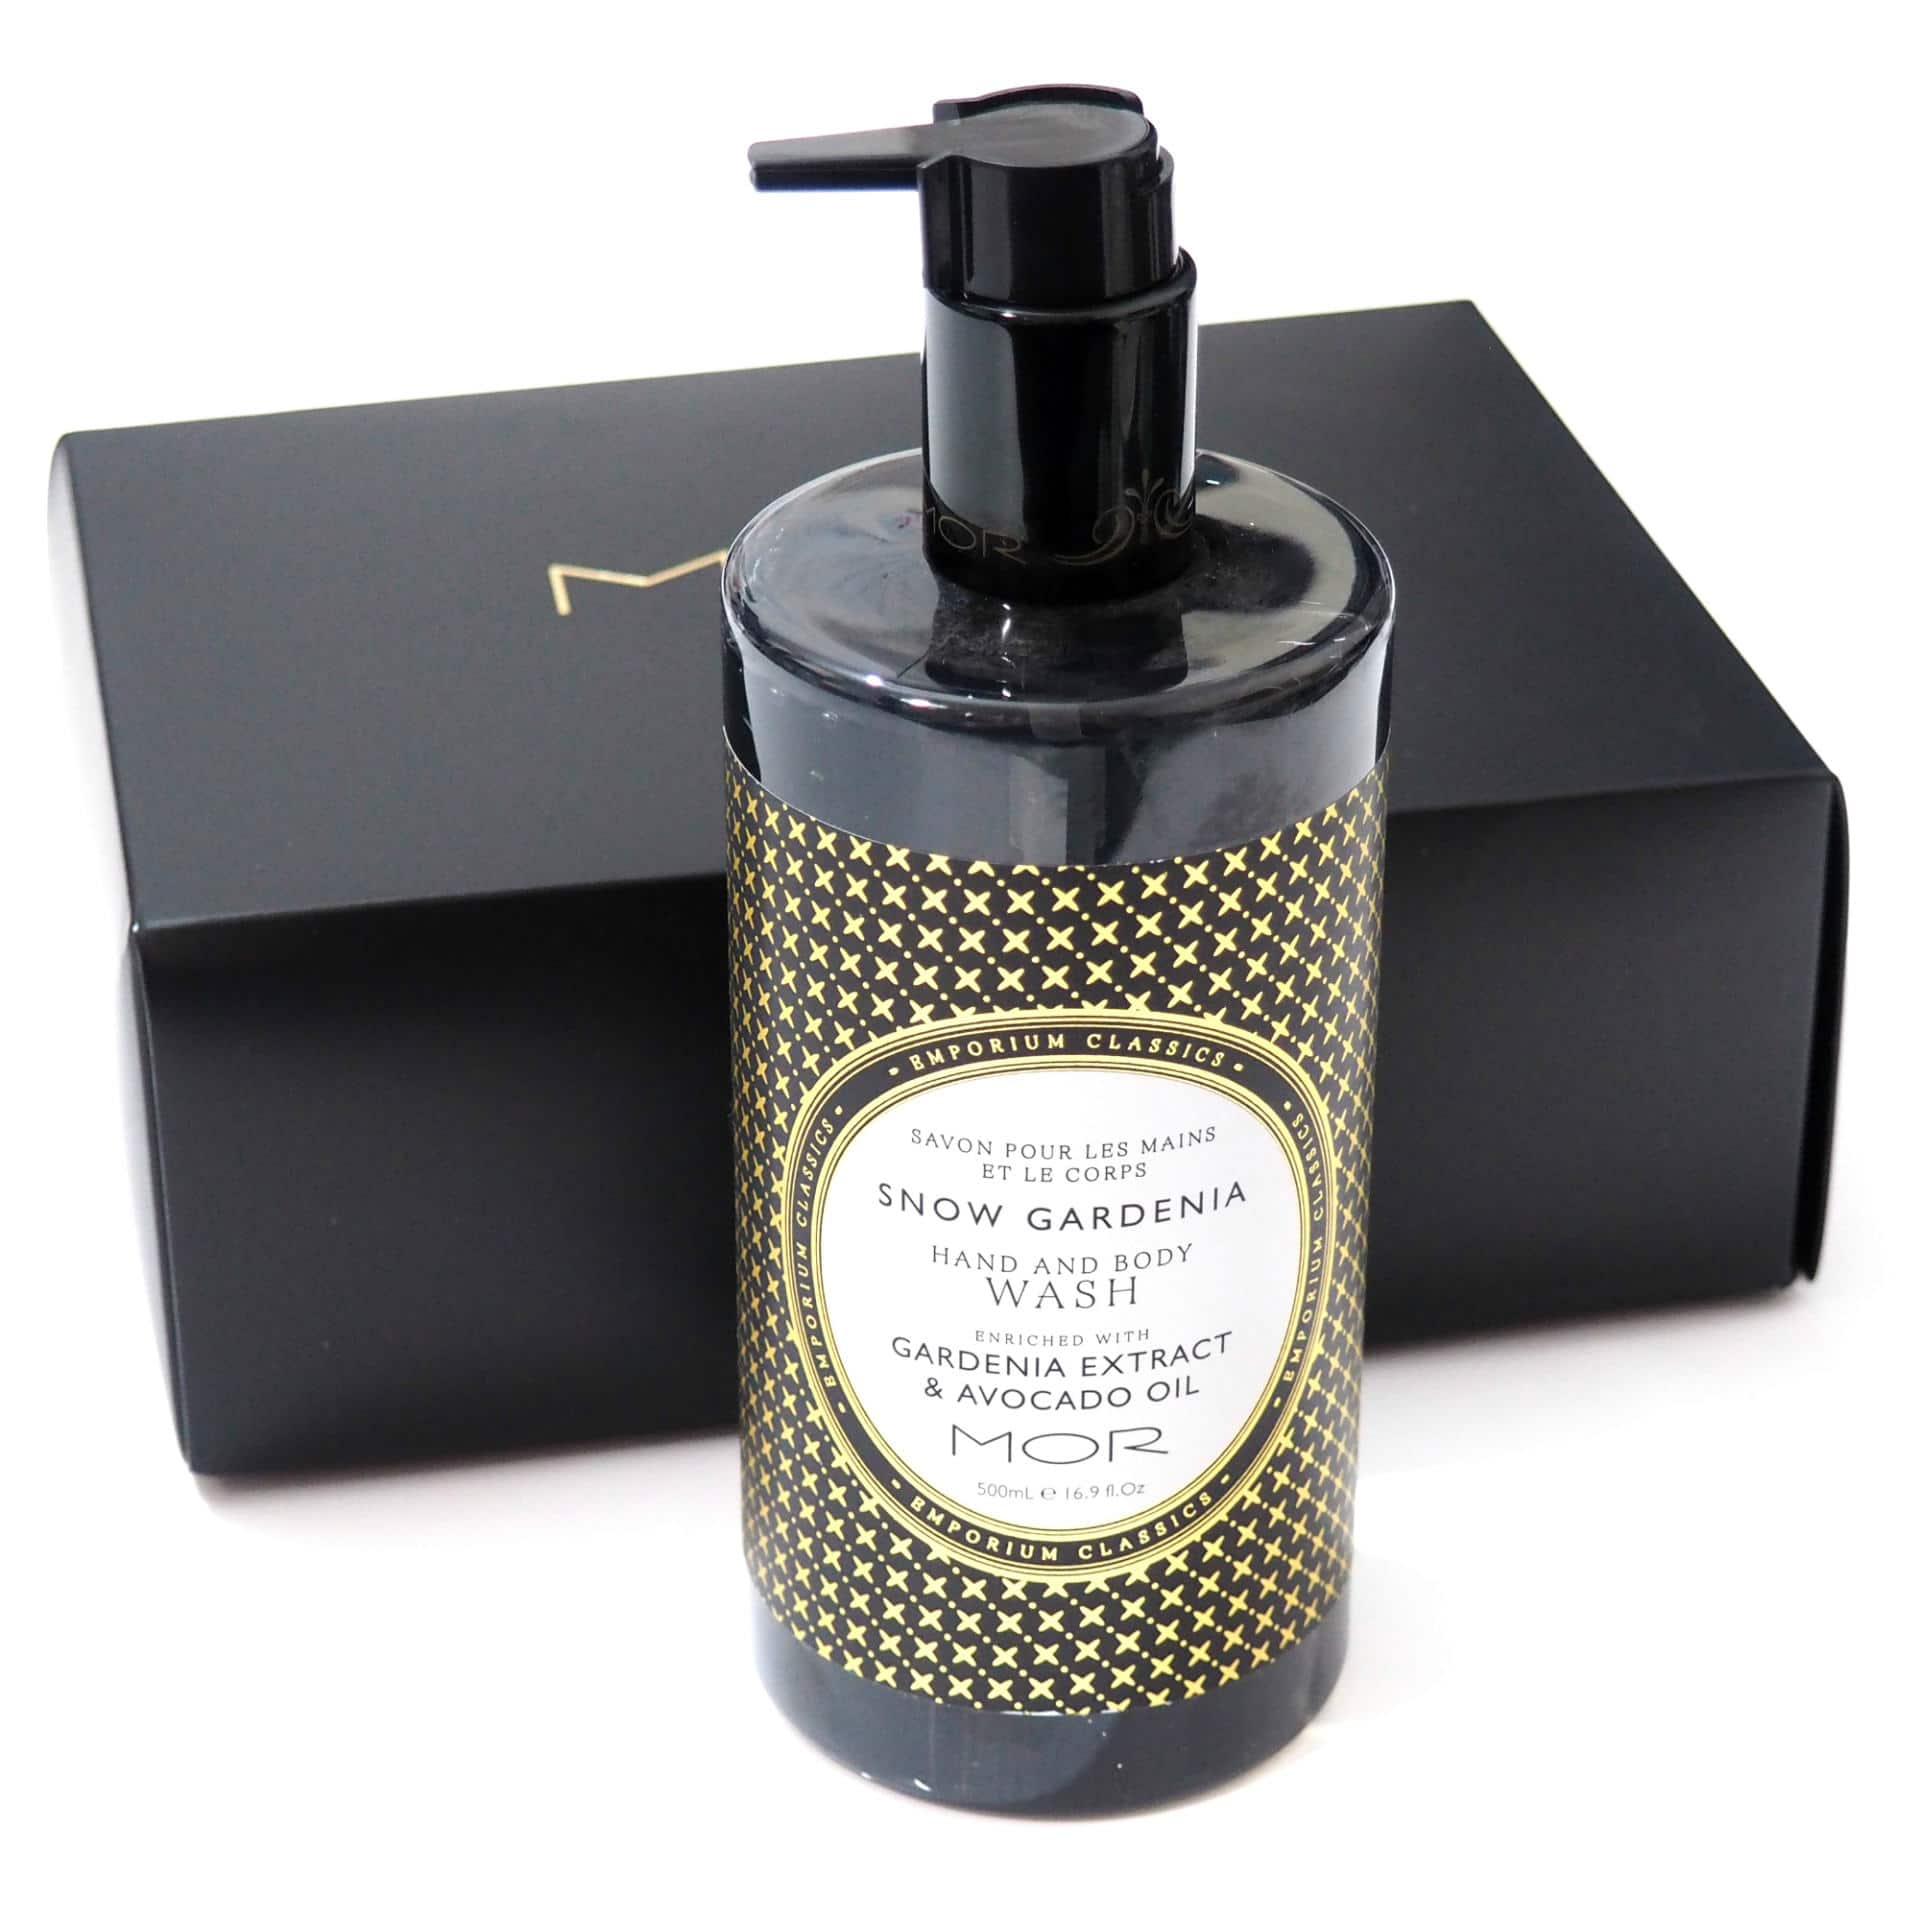 MOR Snow Gardenia Hand and Body Wash